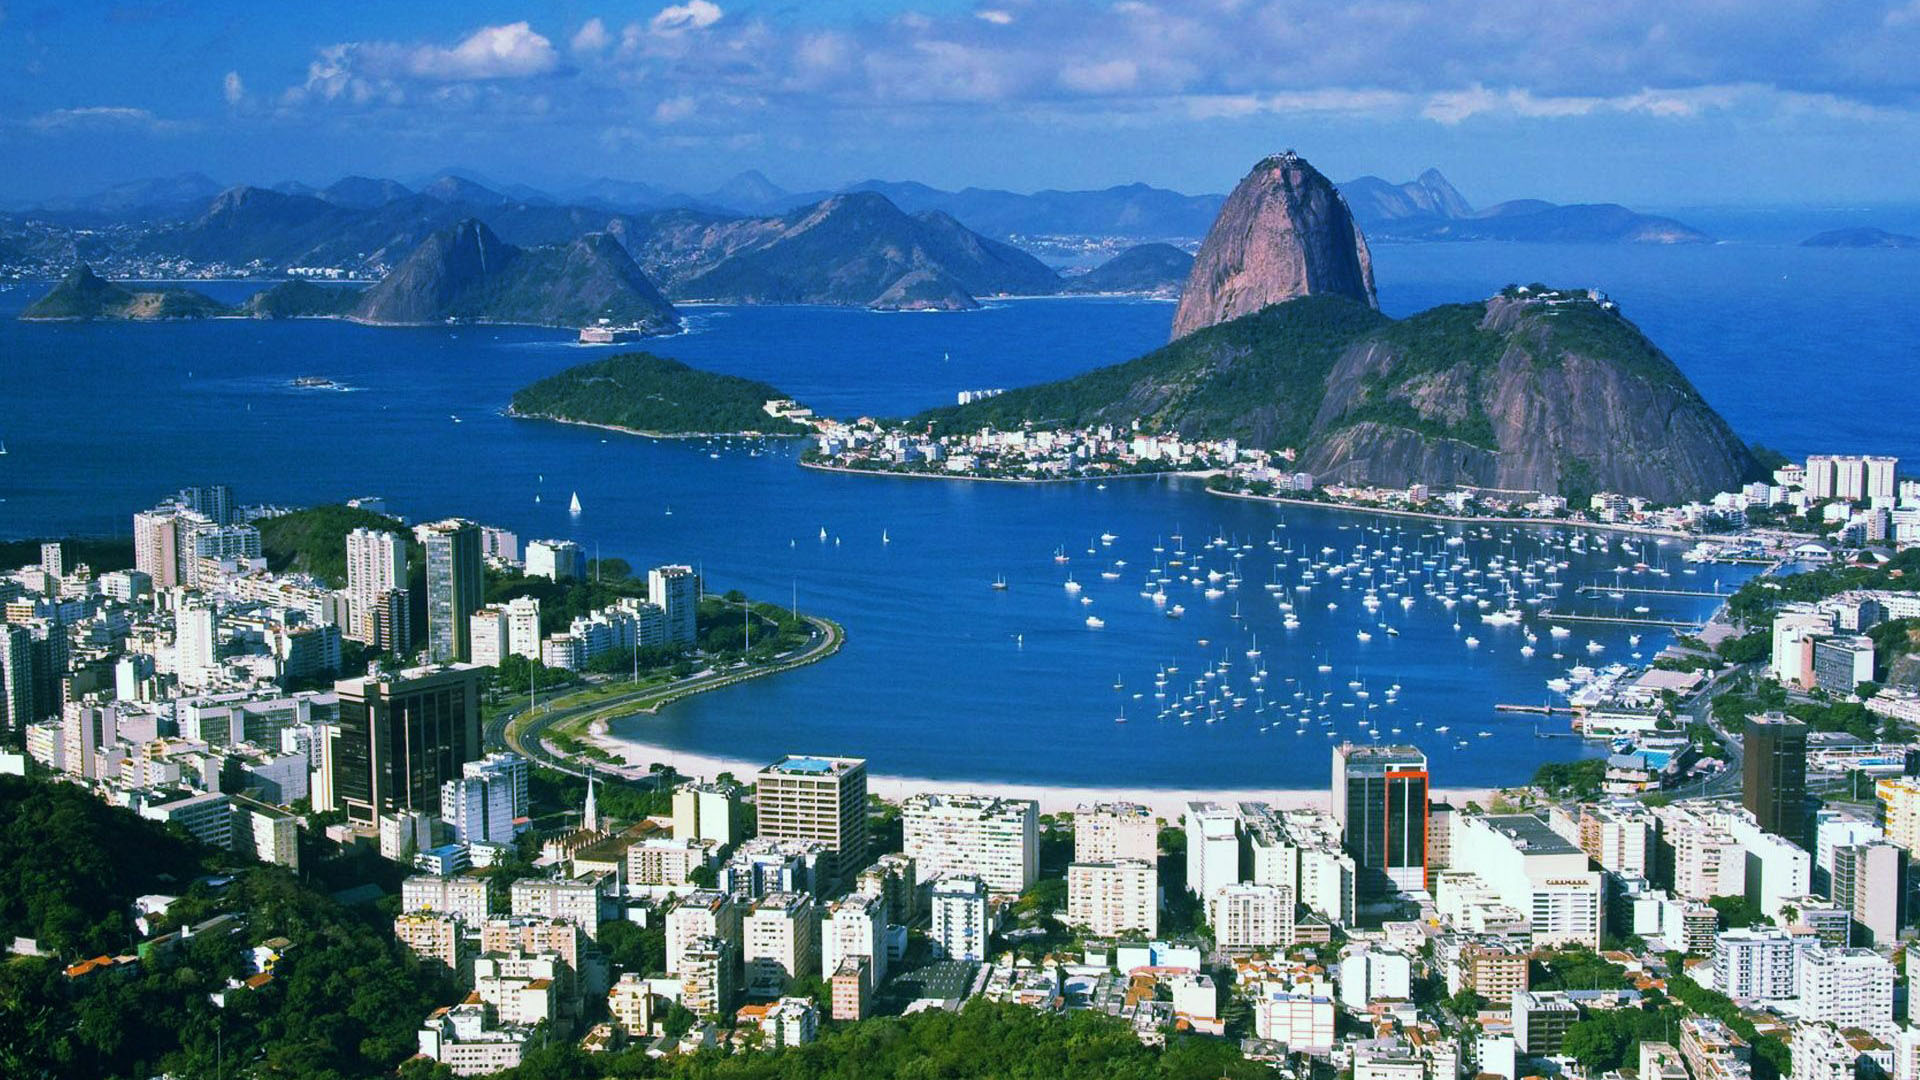 Pics Photos   Rio De Janeiro Scenery Hd 1366x768 Hd 1920x1080